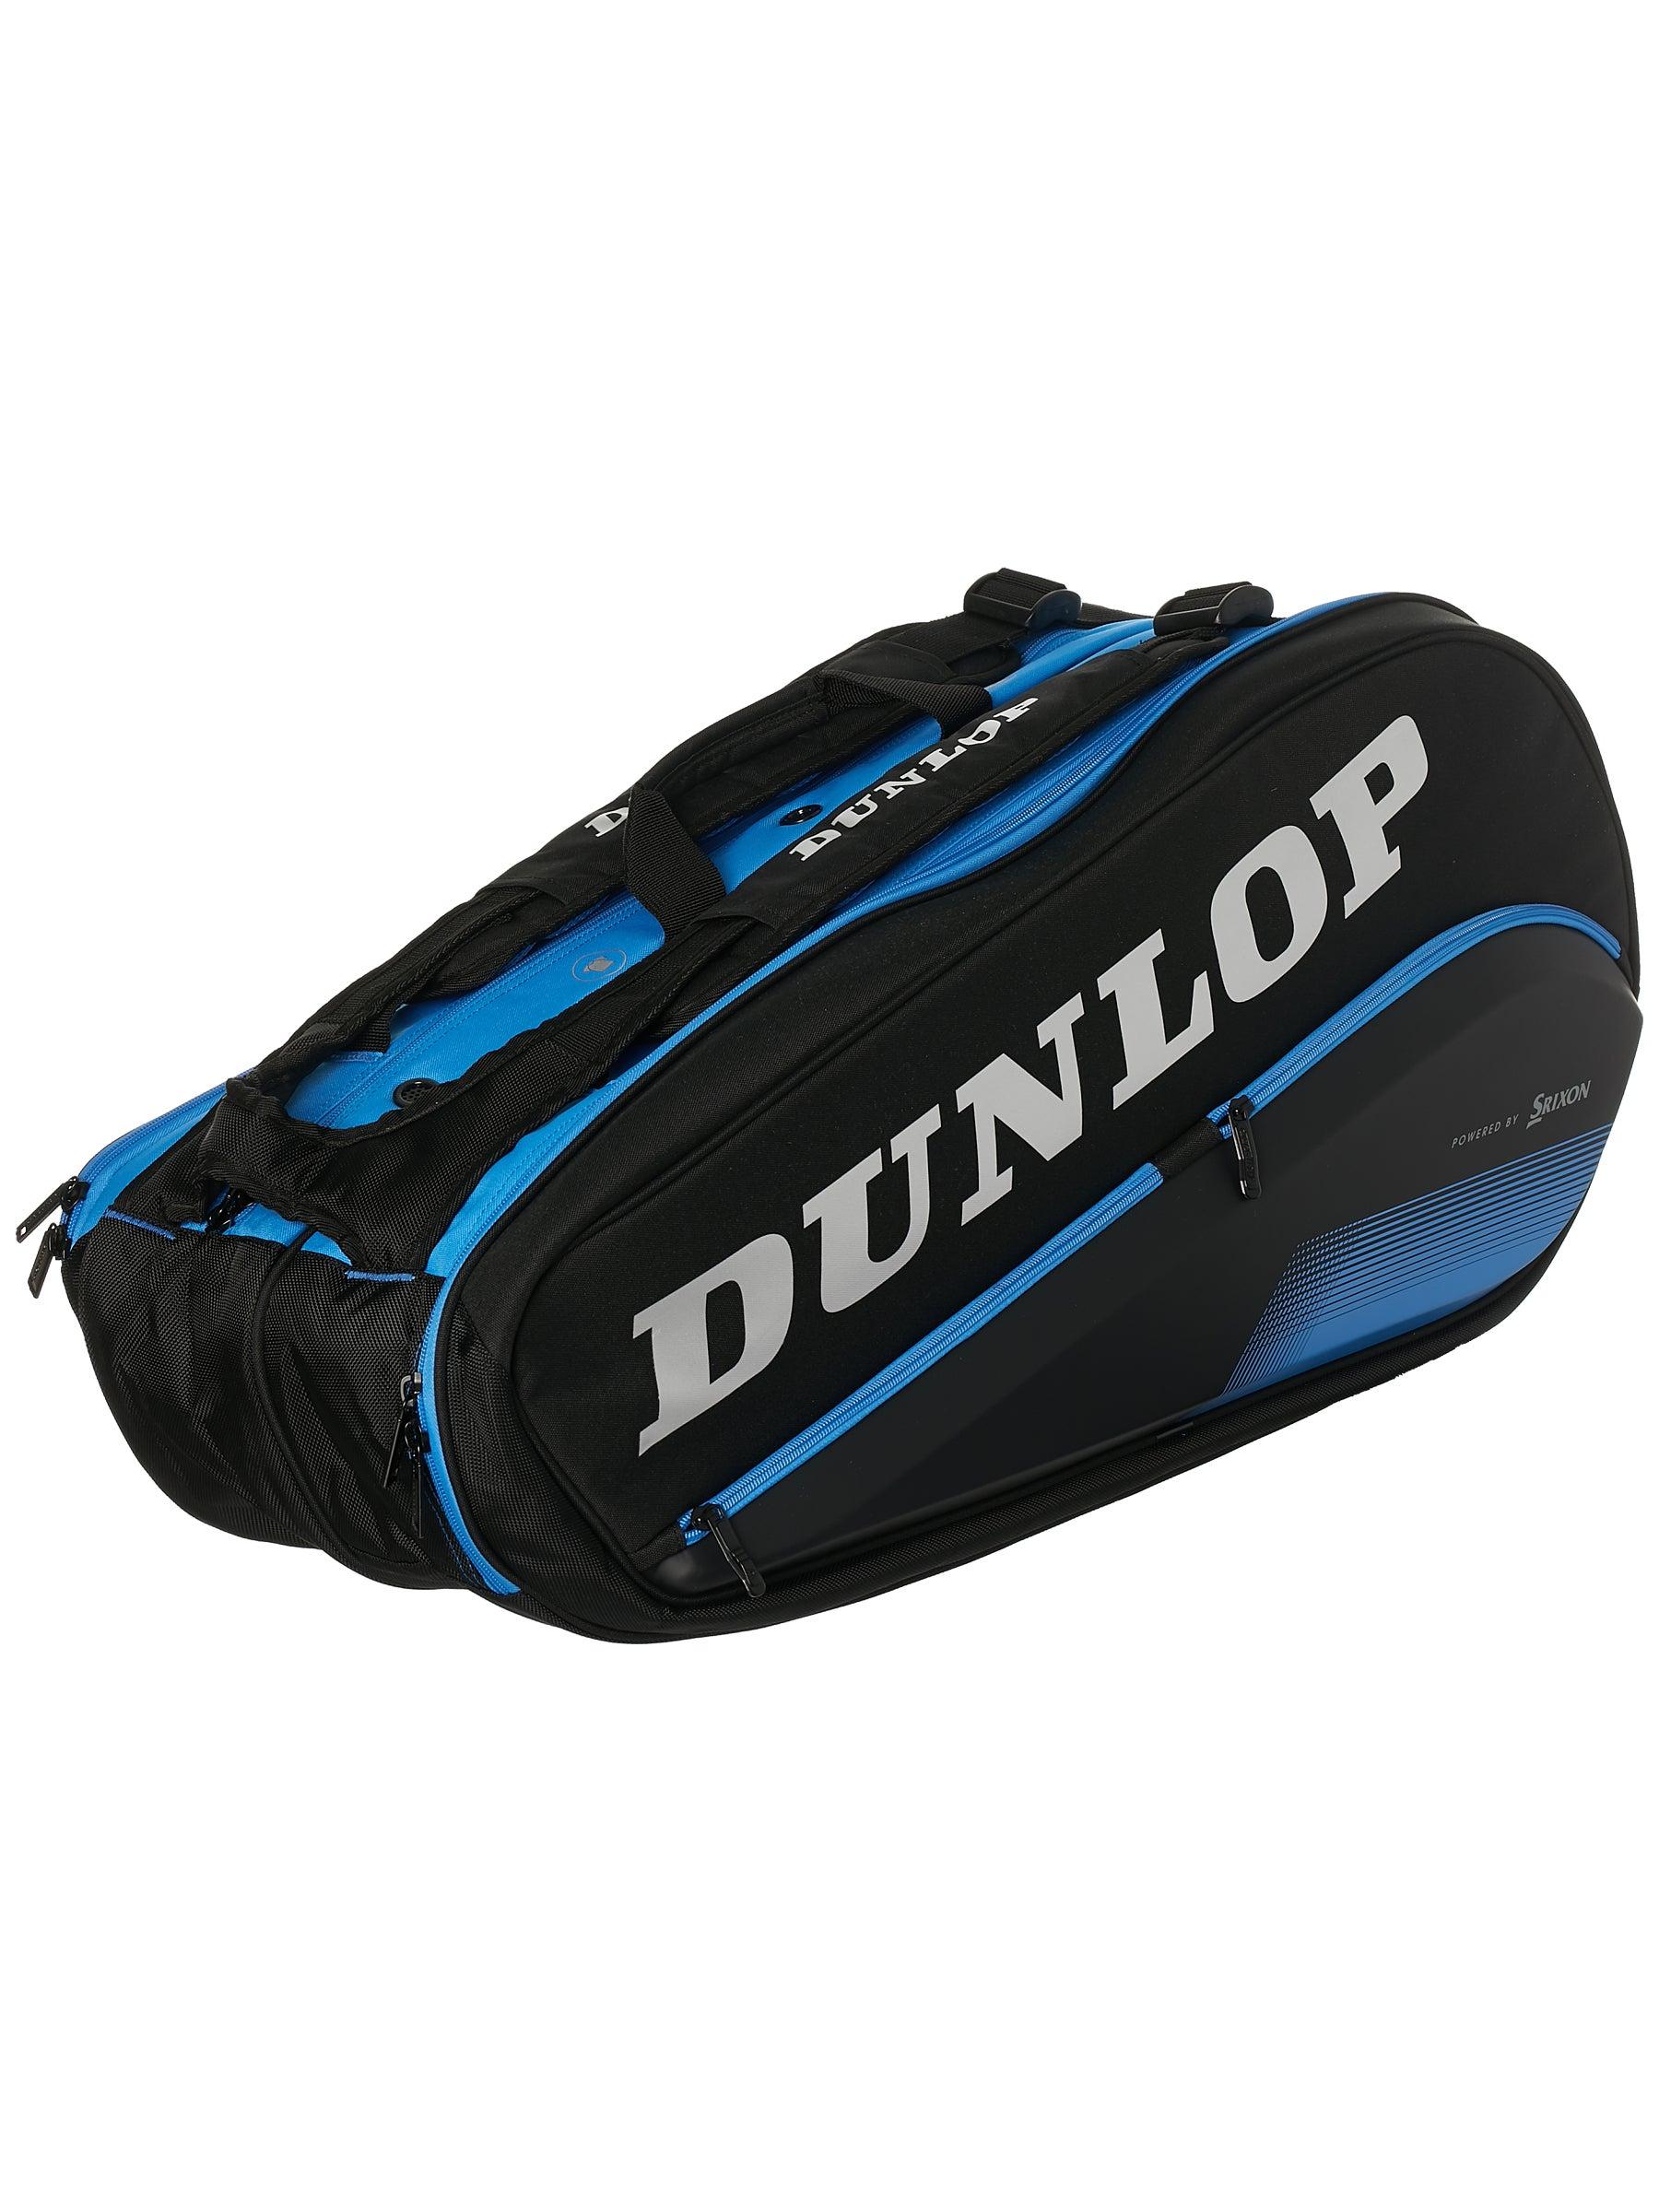 Dunlop Fx Performance 8 Pack Bag